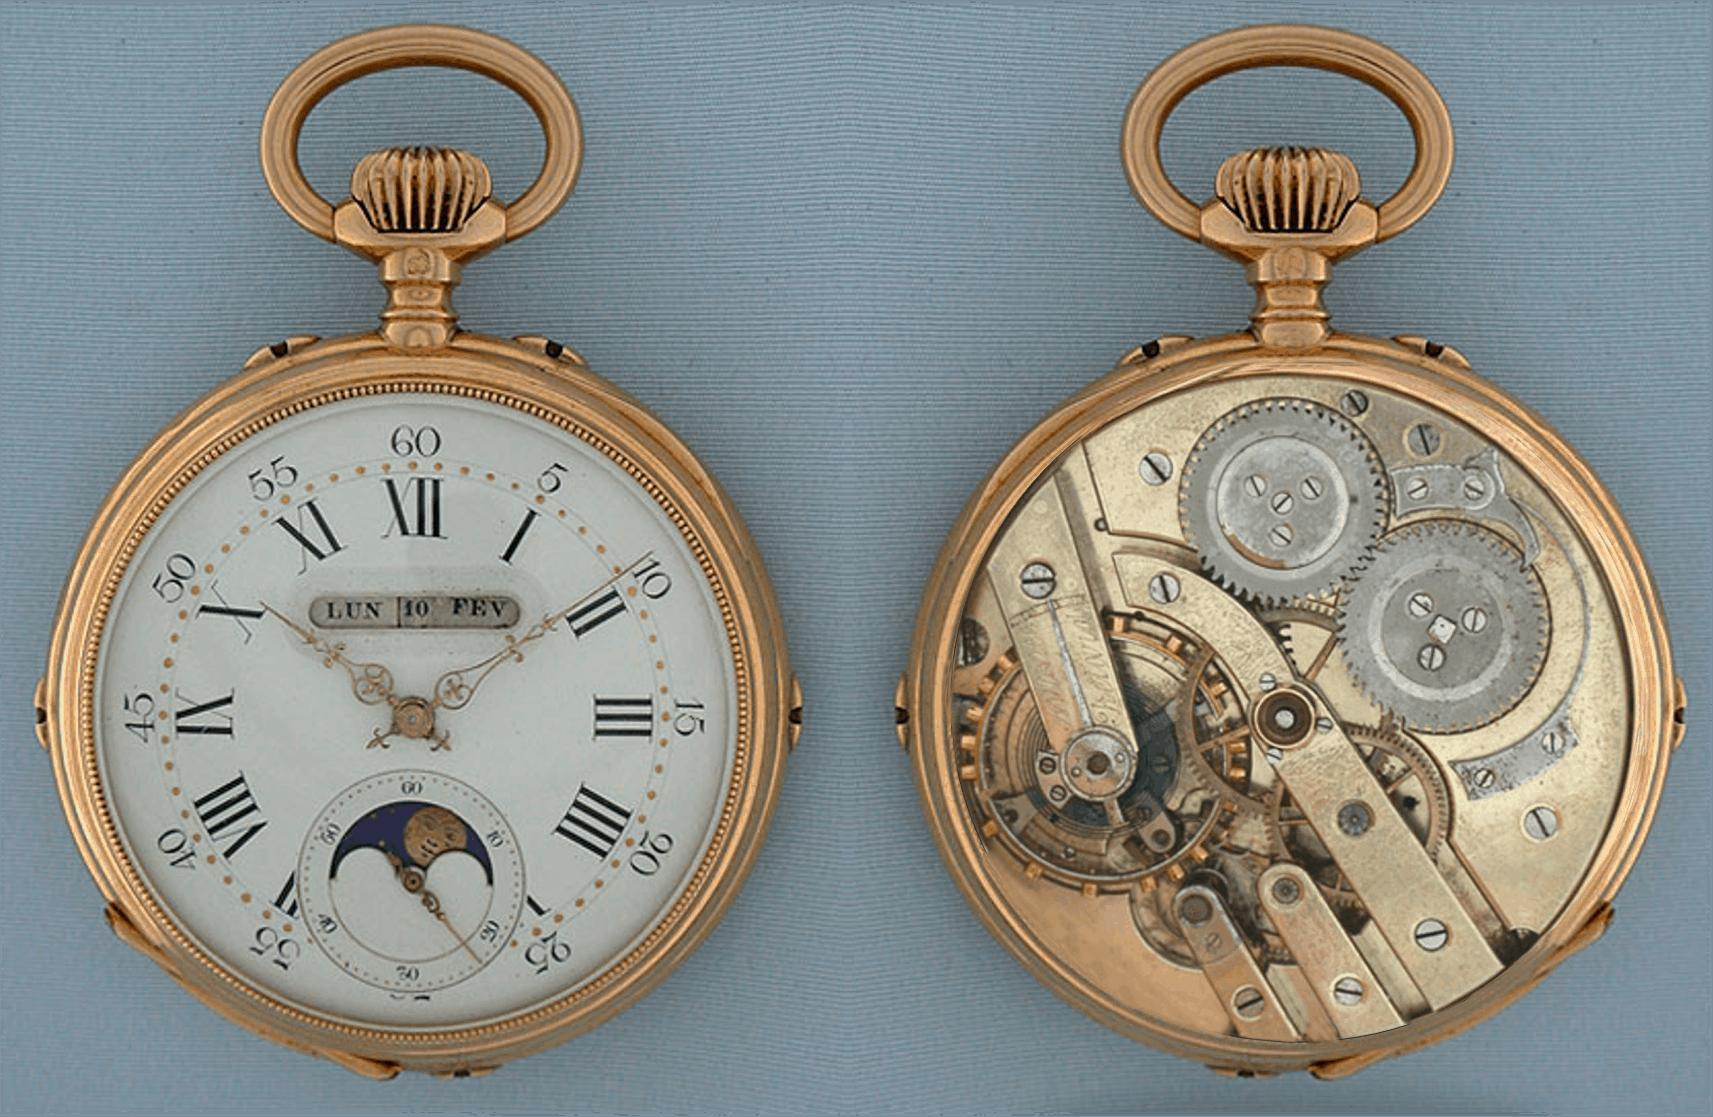 Taschenuhr linearer Vollkalender Mondphasen LeCoultre-Kaliber ca 1890